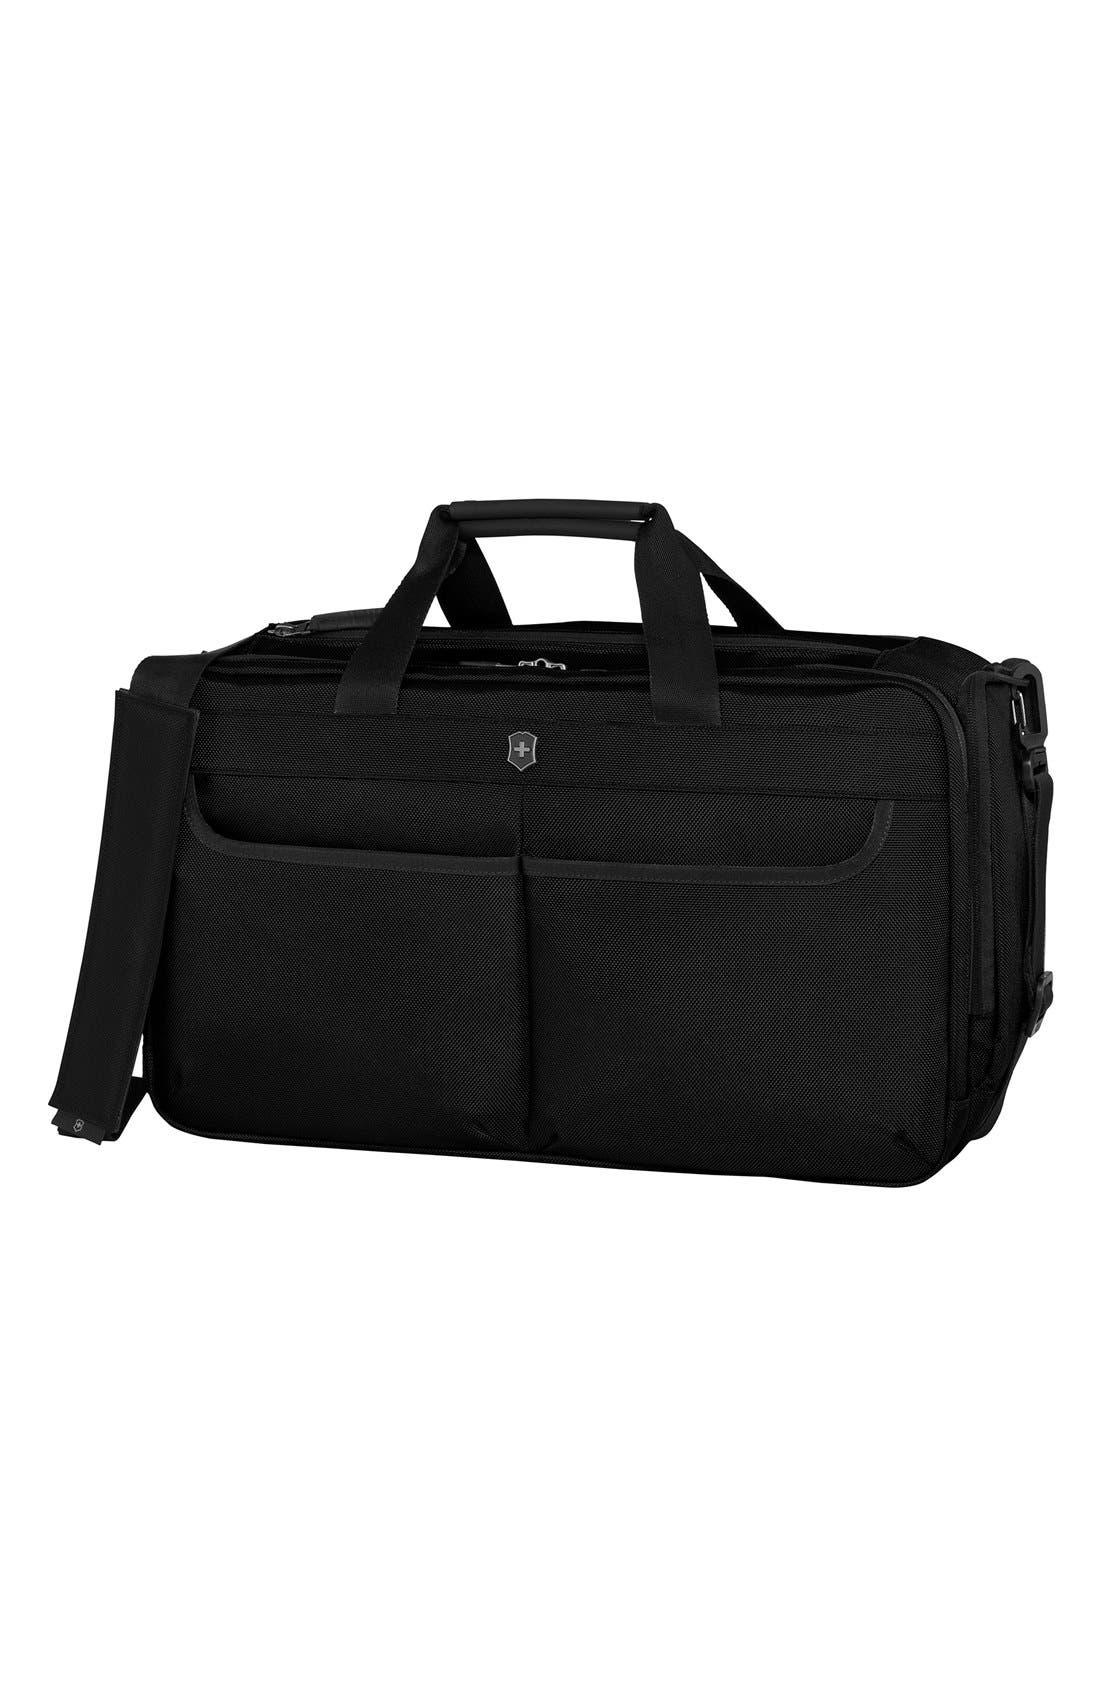 WT 5.0 Duffel Bag,                         Main,                         color, BLACK